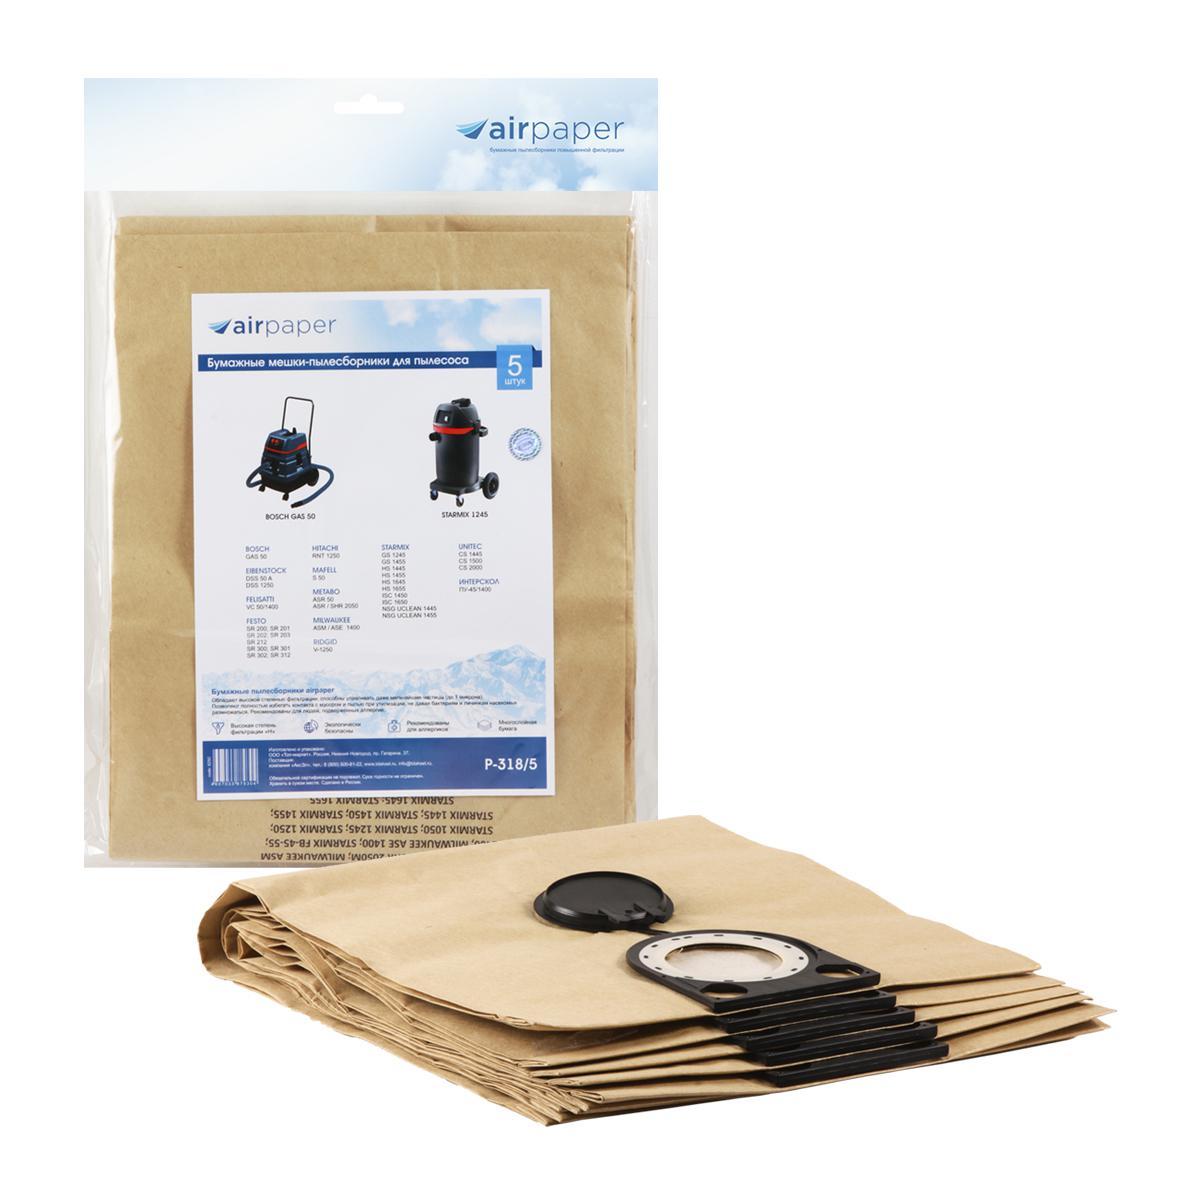 Мешок Air paper P-318/5 мешок air paper p 3031